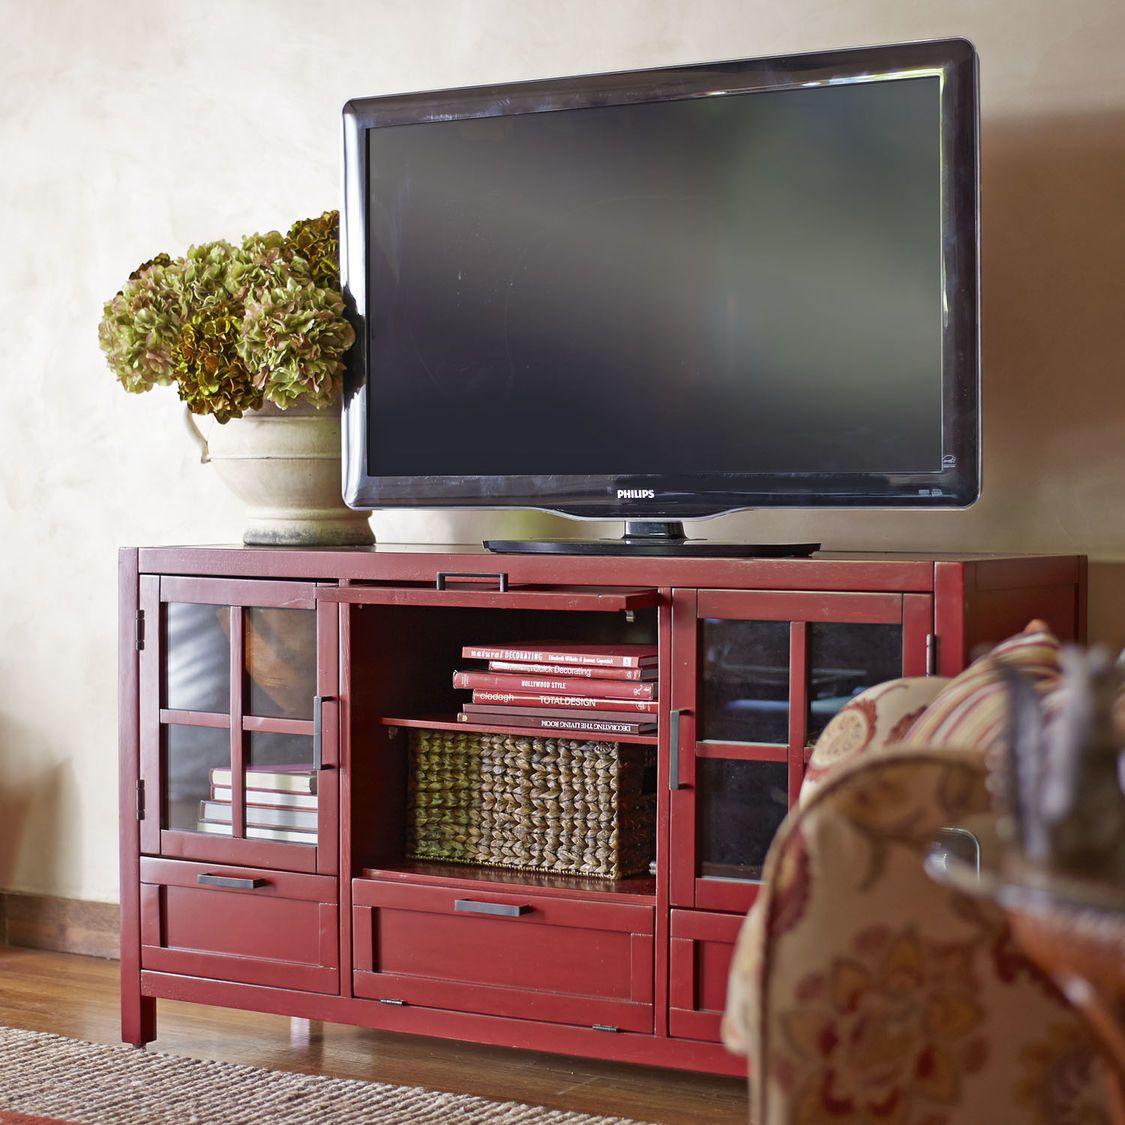 Sausalito Medium TV Stand - Antique Red - Sausalito Medium TV Stand - Antique Red Home Pinterest Tv